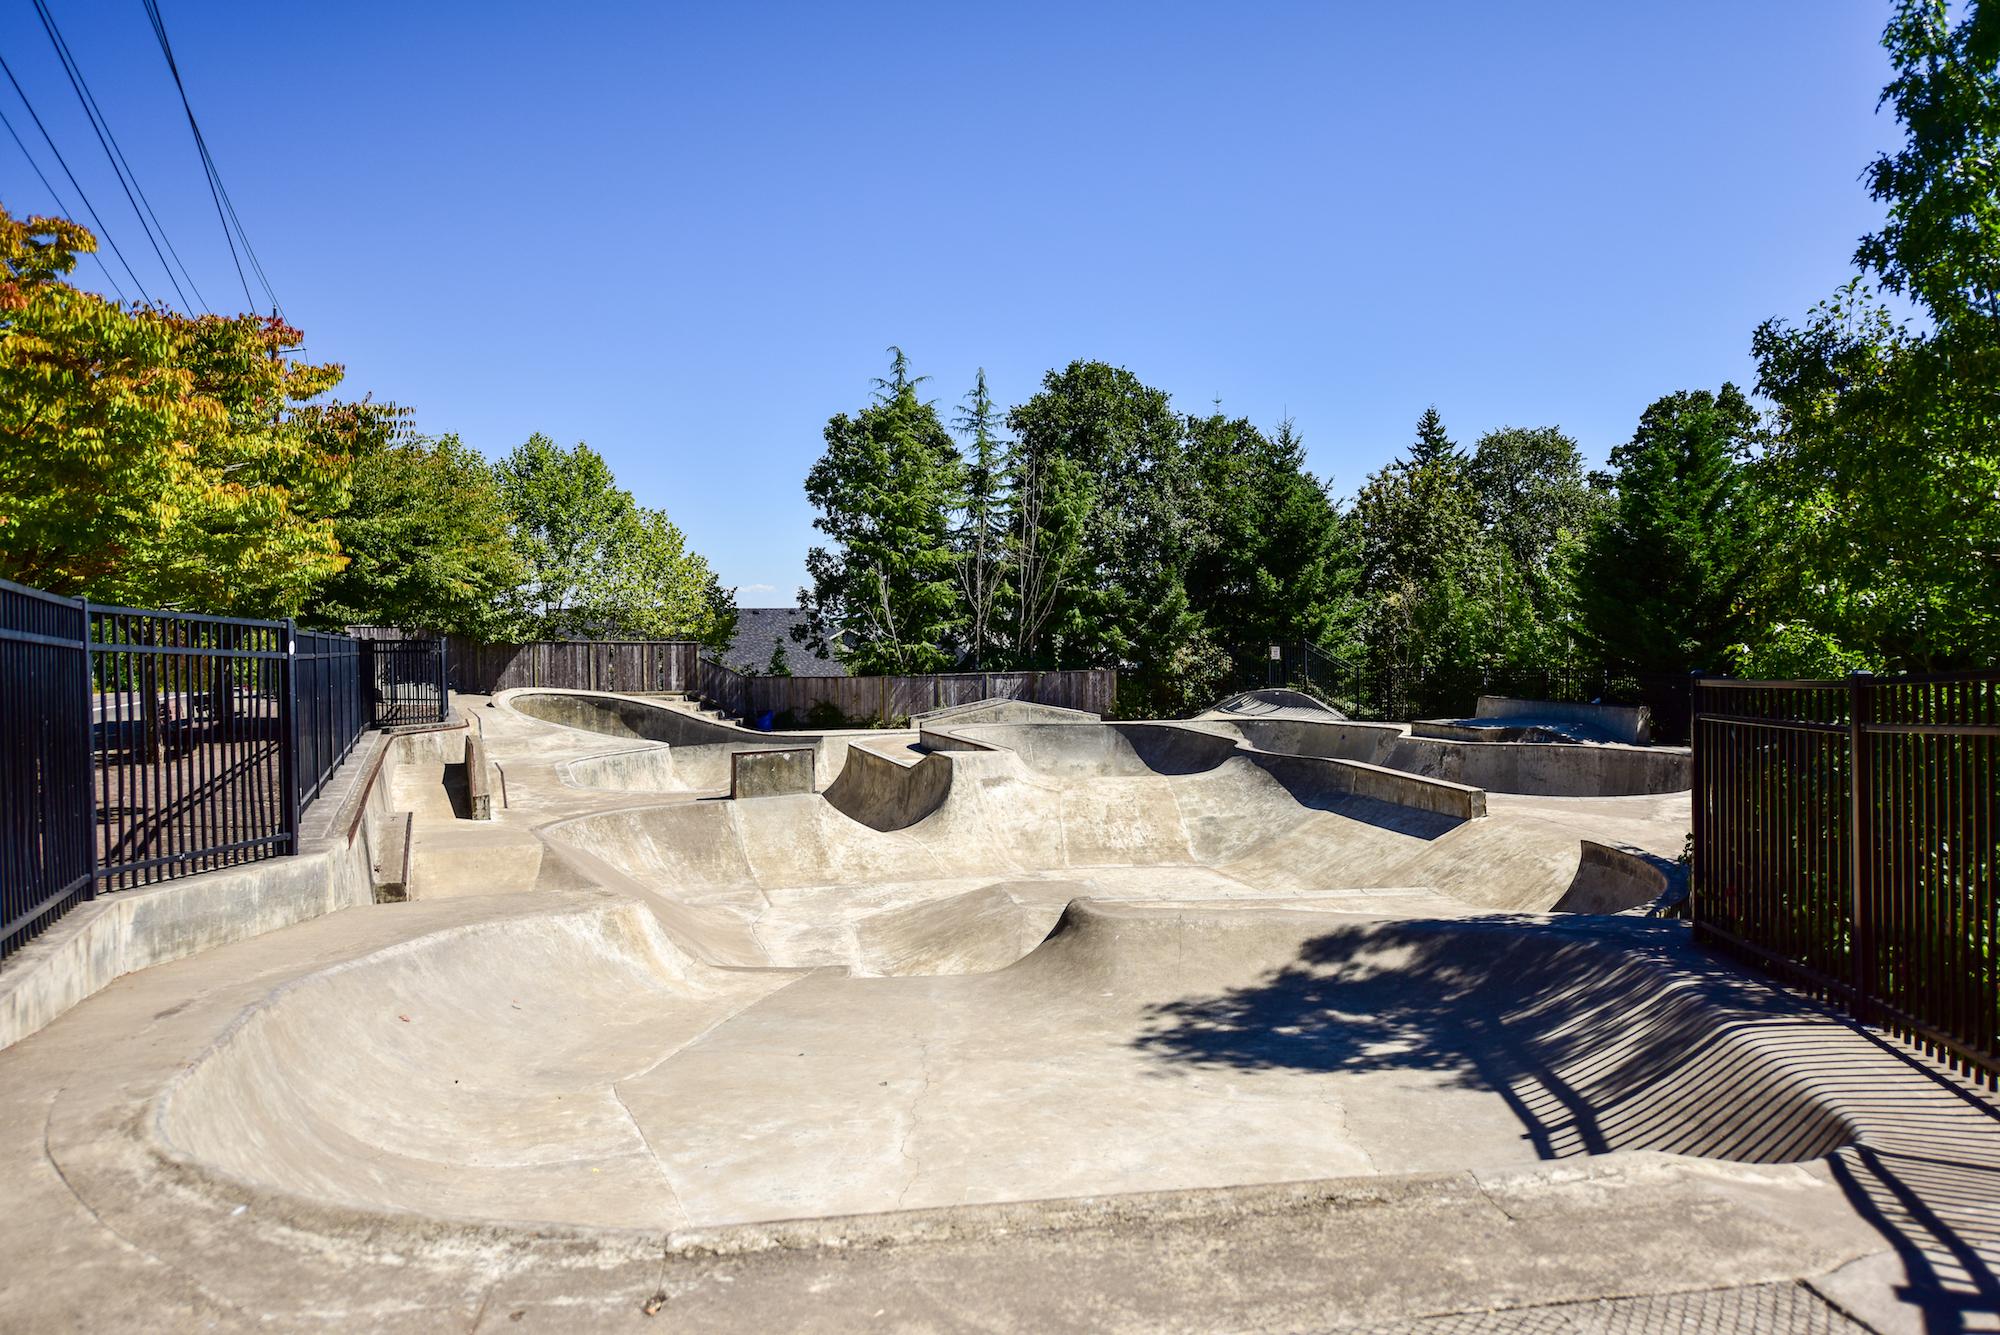 West Linn Skate Park